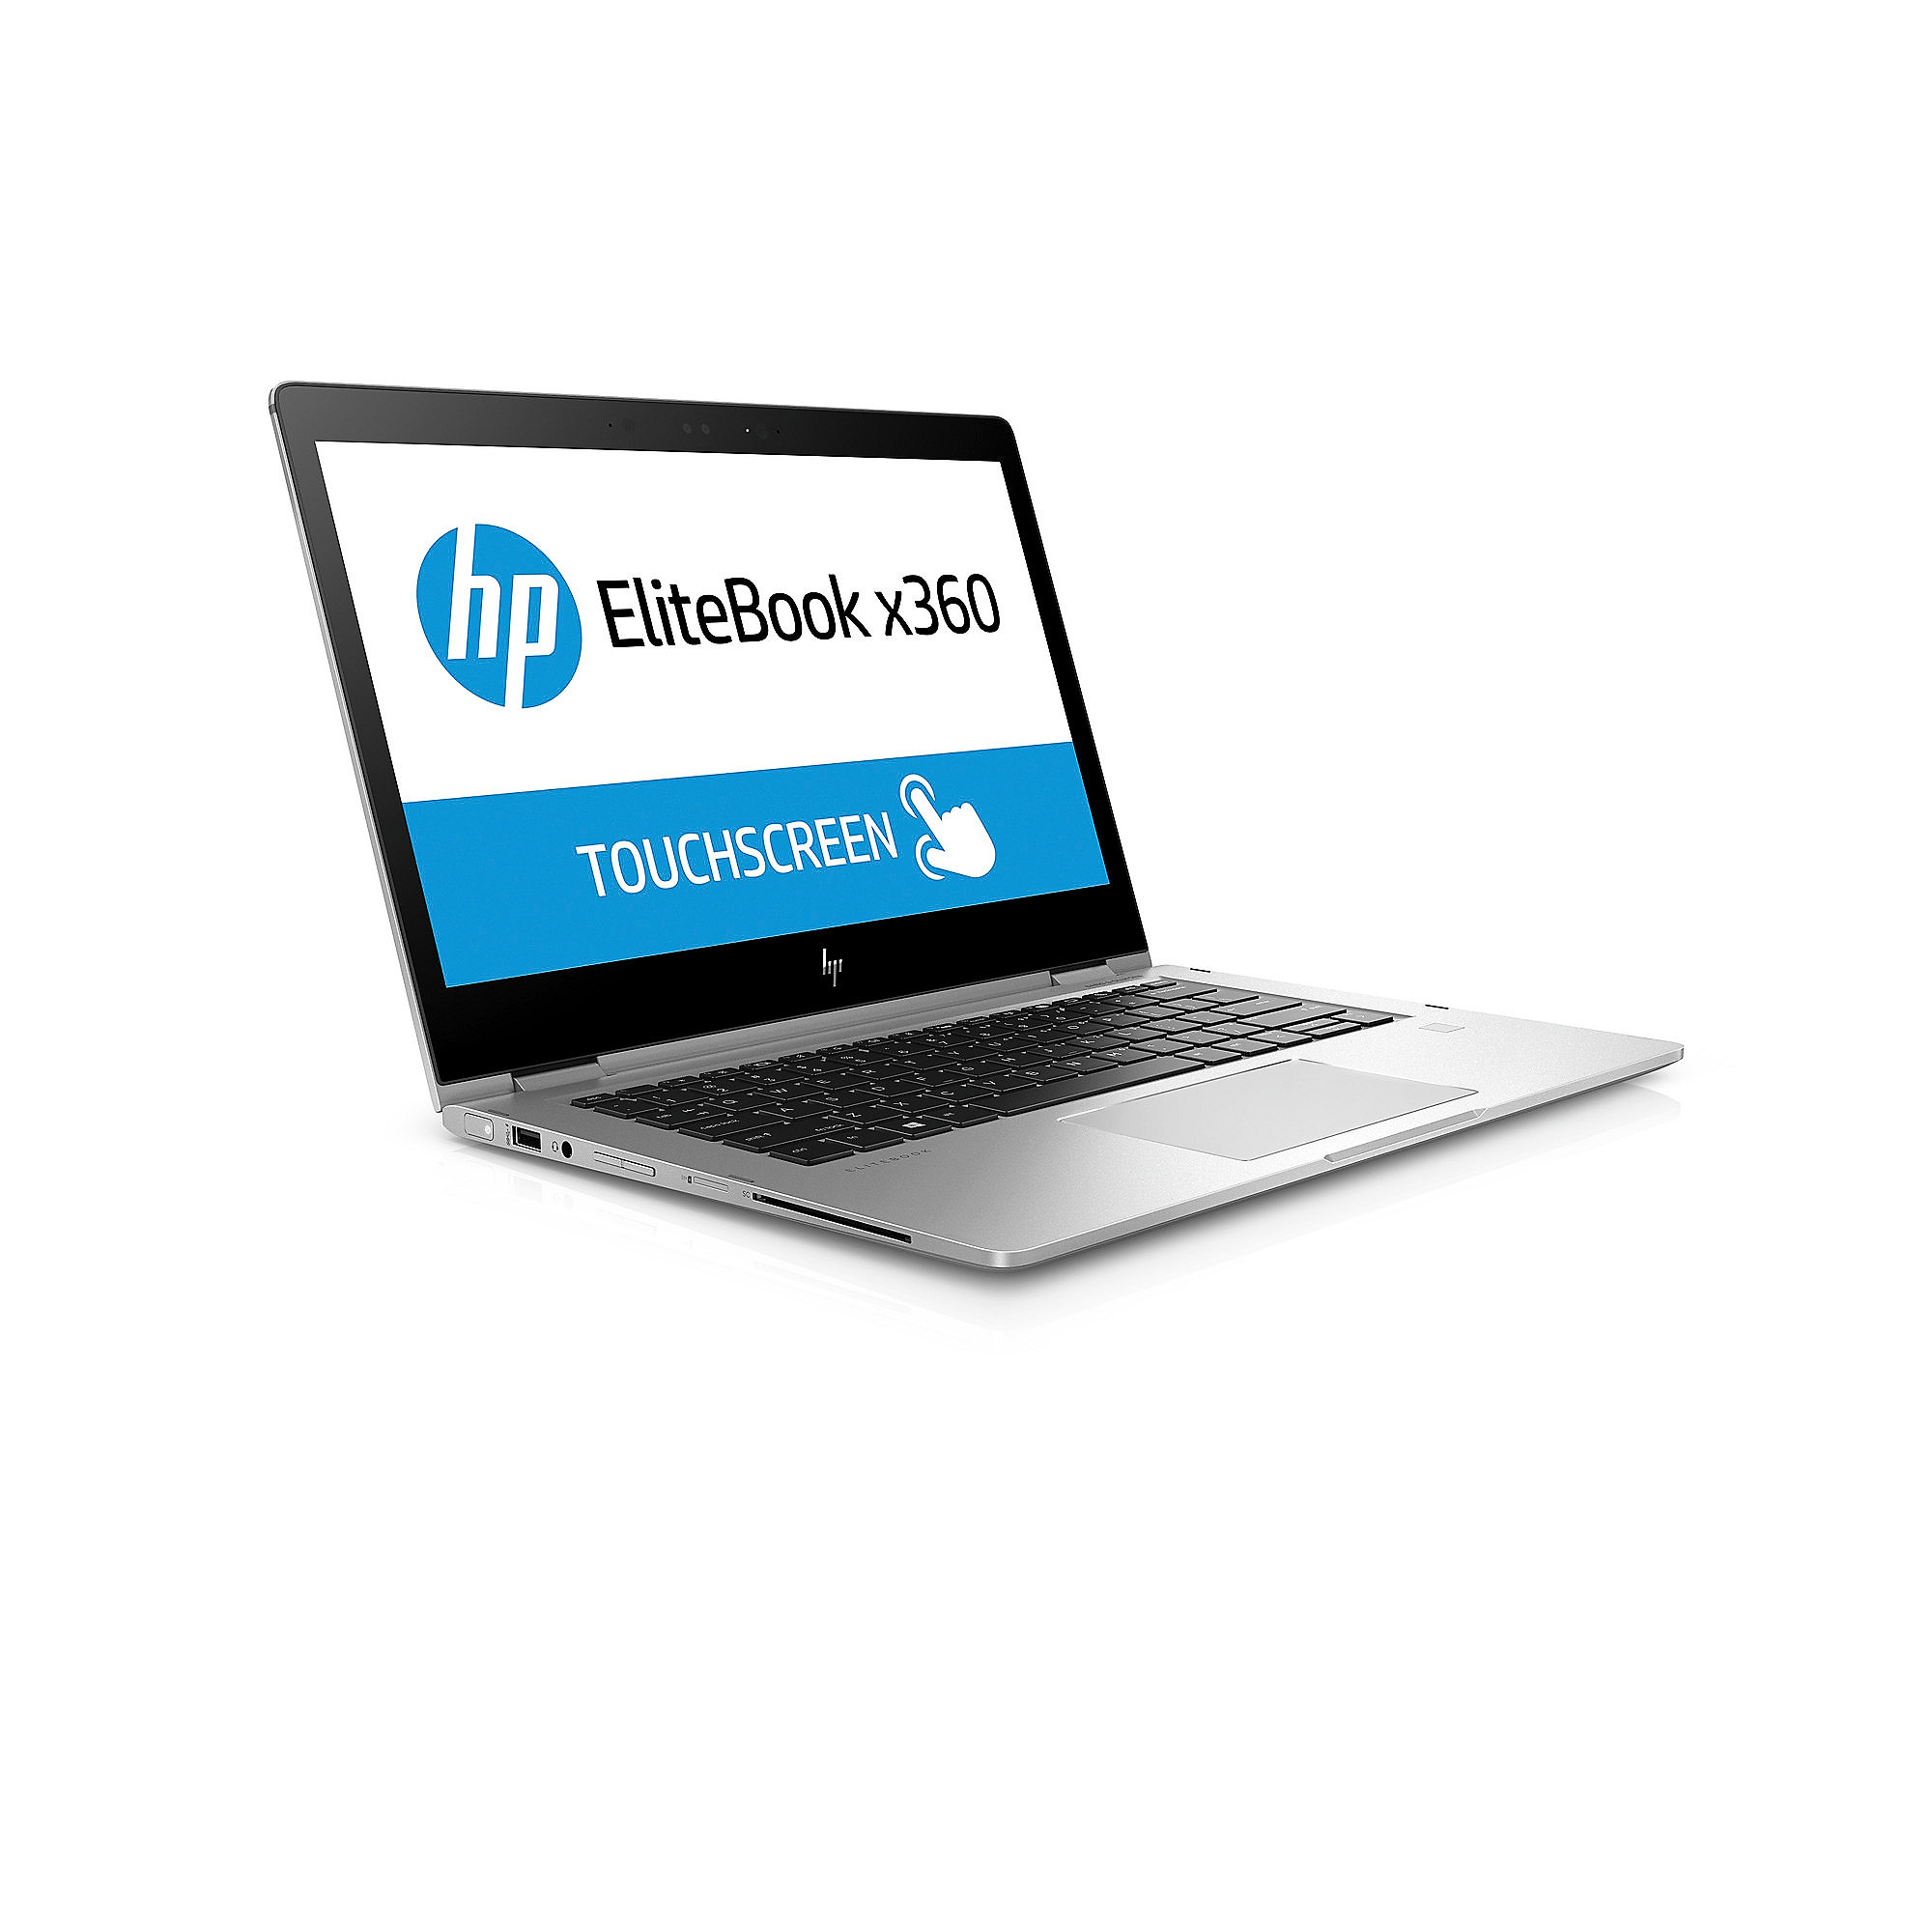 hp elitebook x360 1030 g2 manual